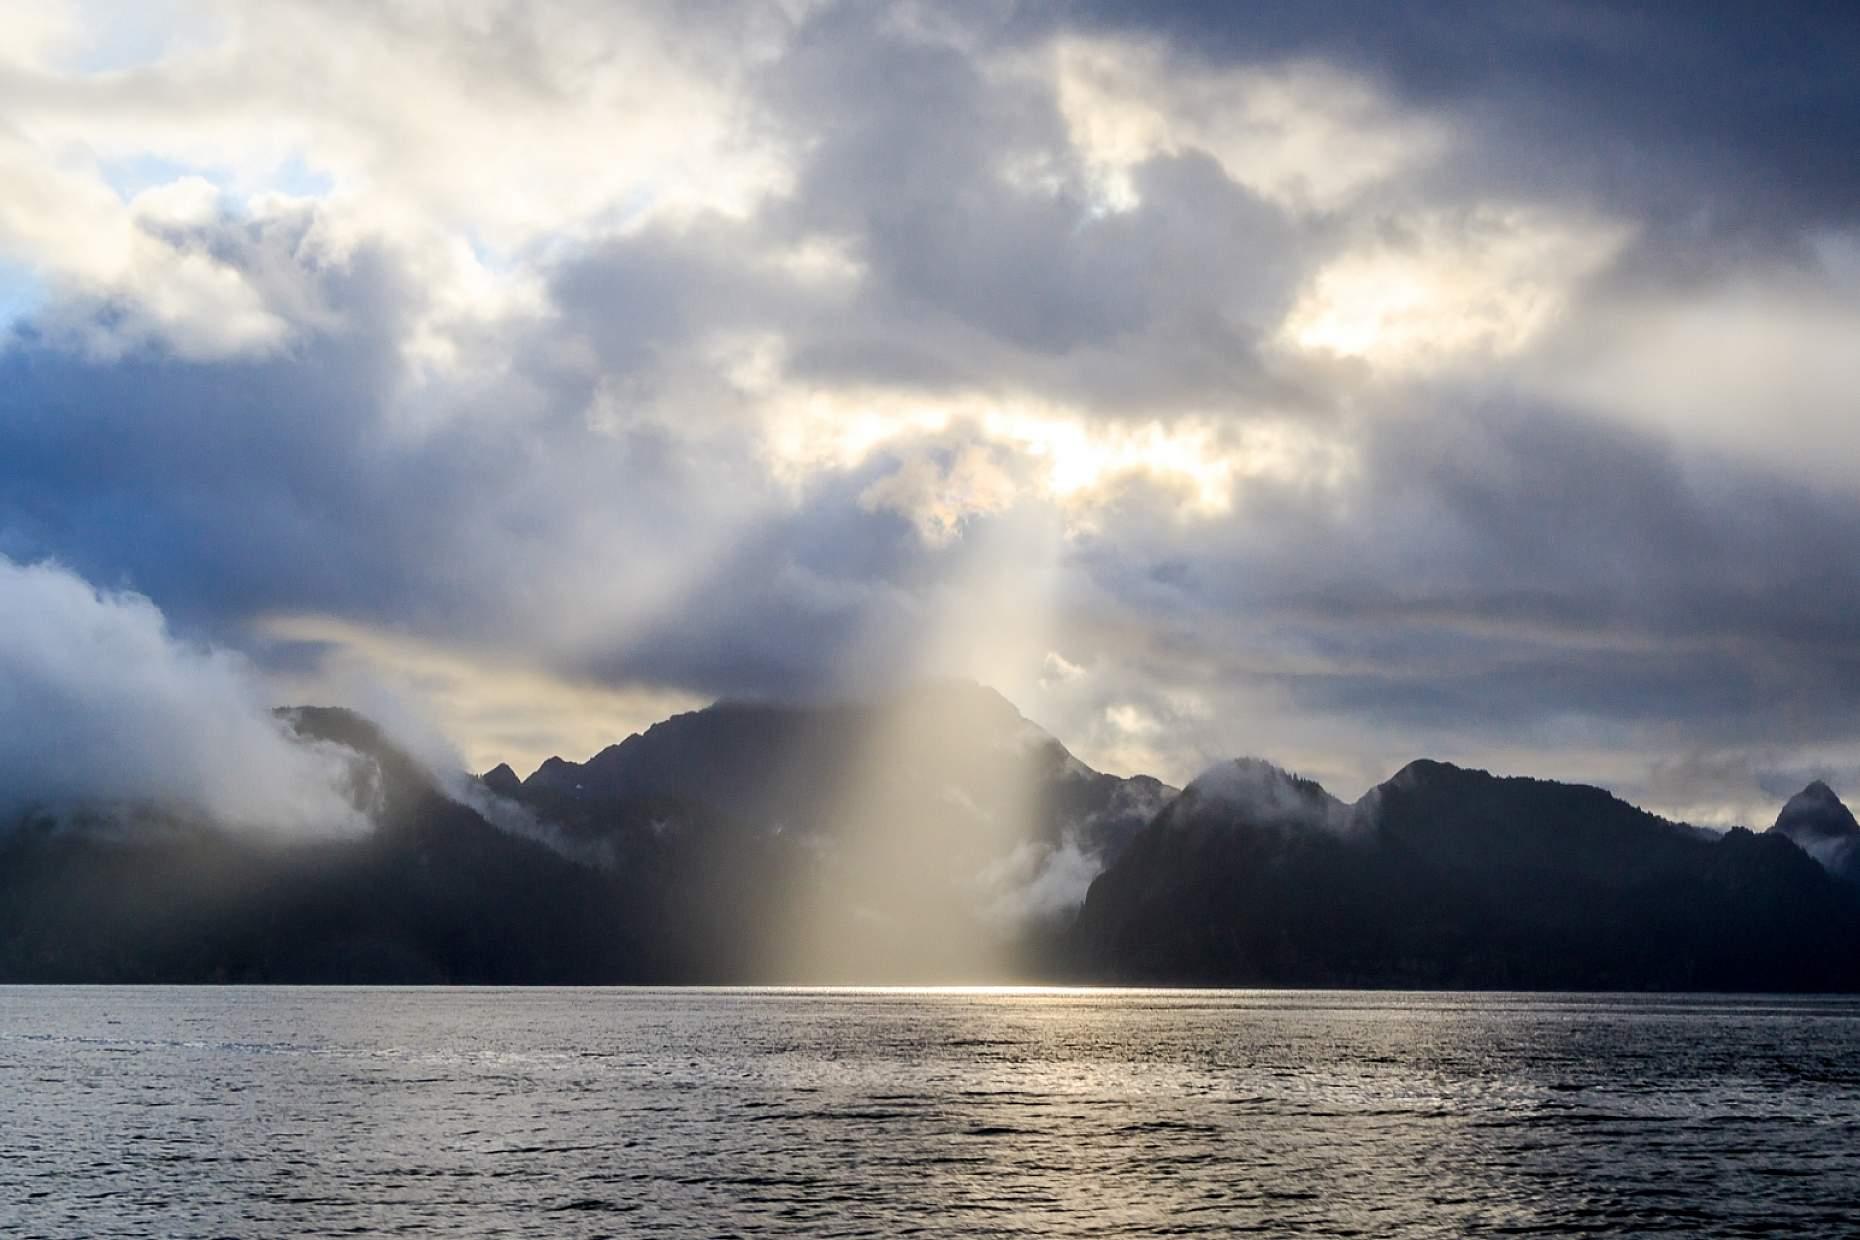 Sun peaks through the clouds in Kenai Fjords National Park